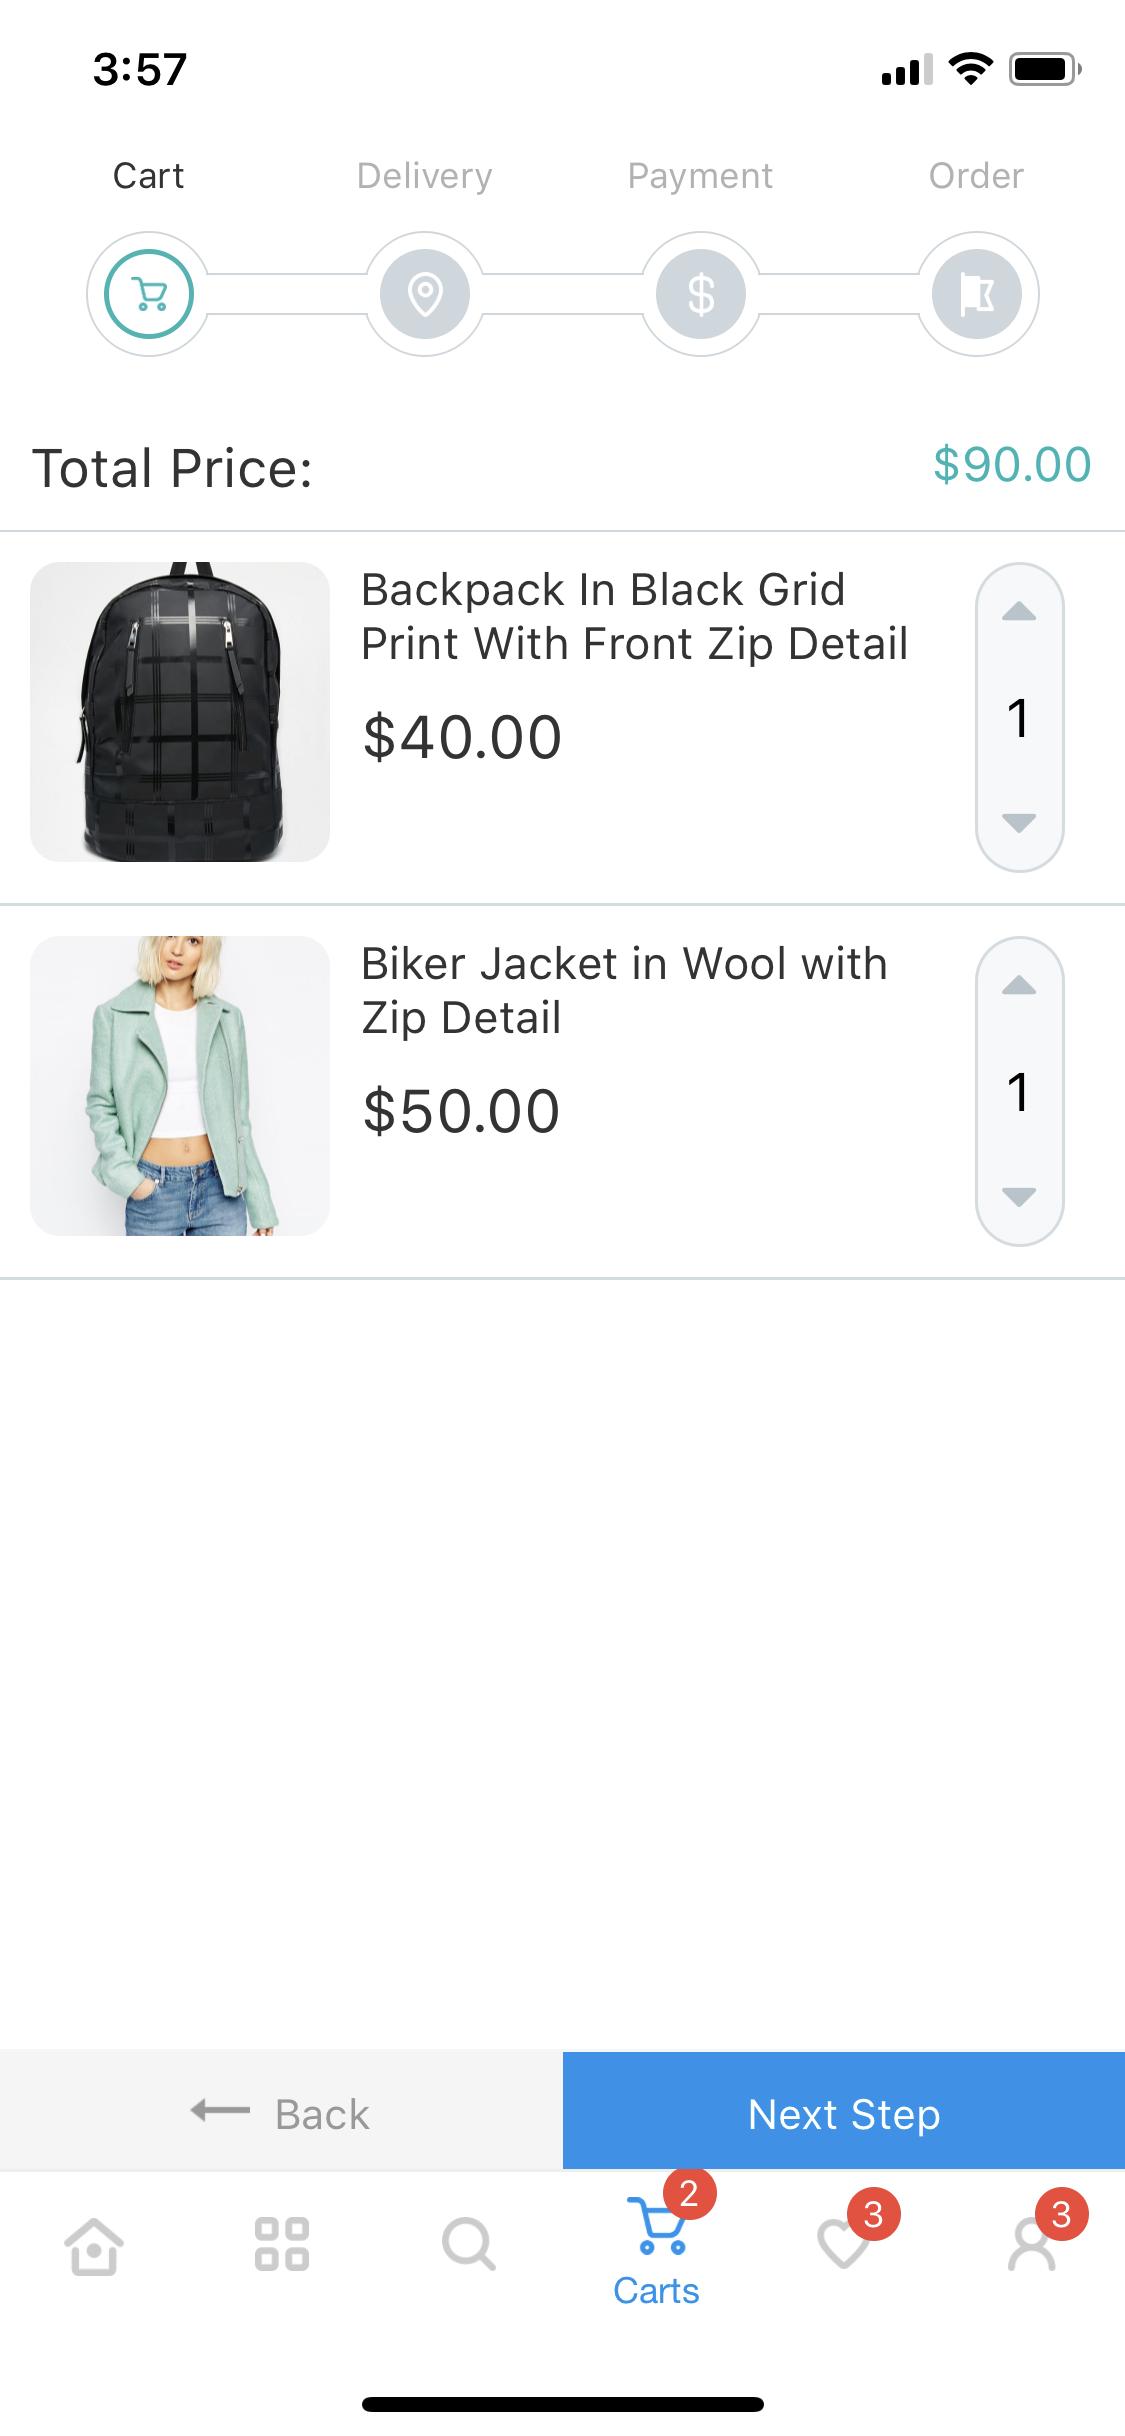 CeStore - ReactJS web app & React Native mobile app for e-commerce